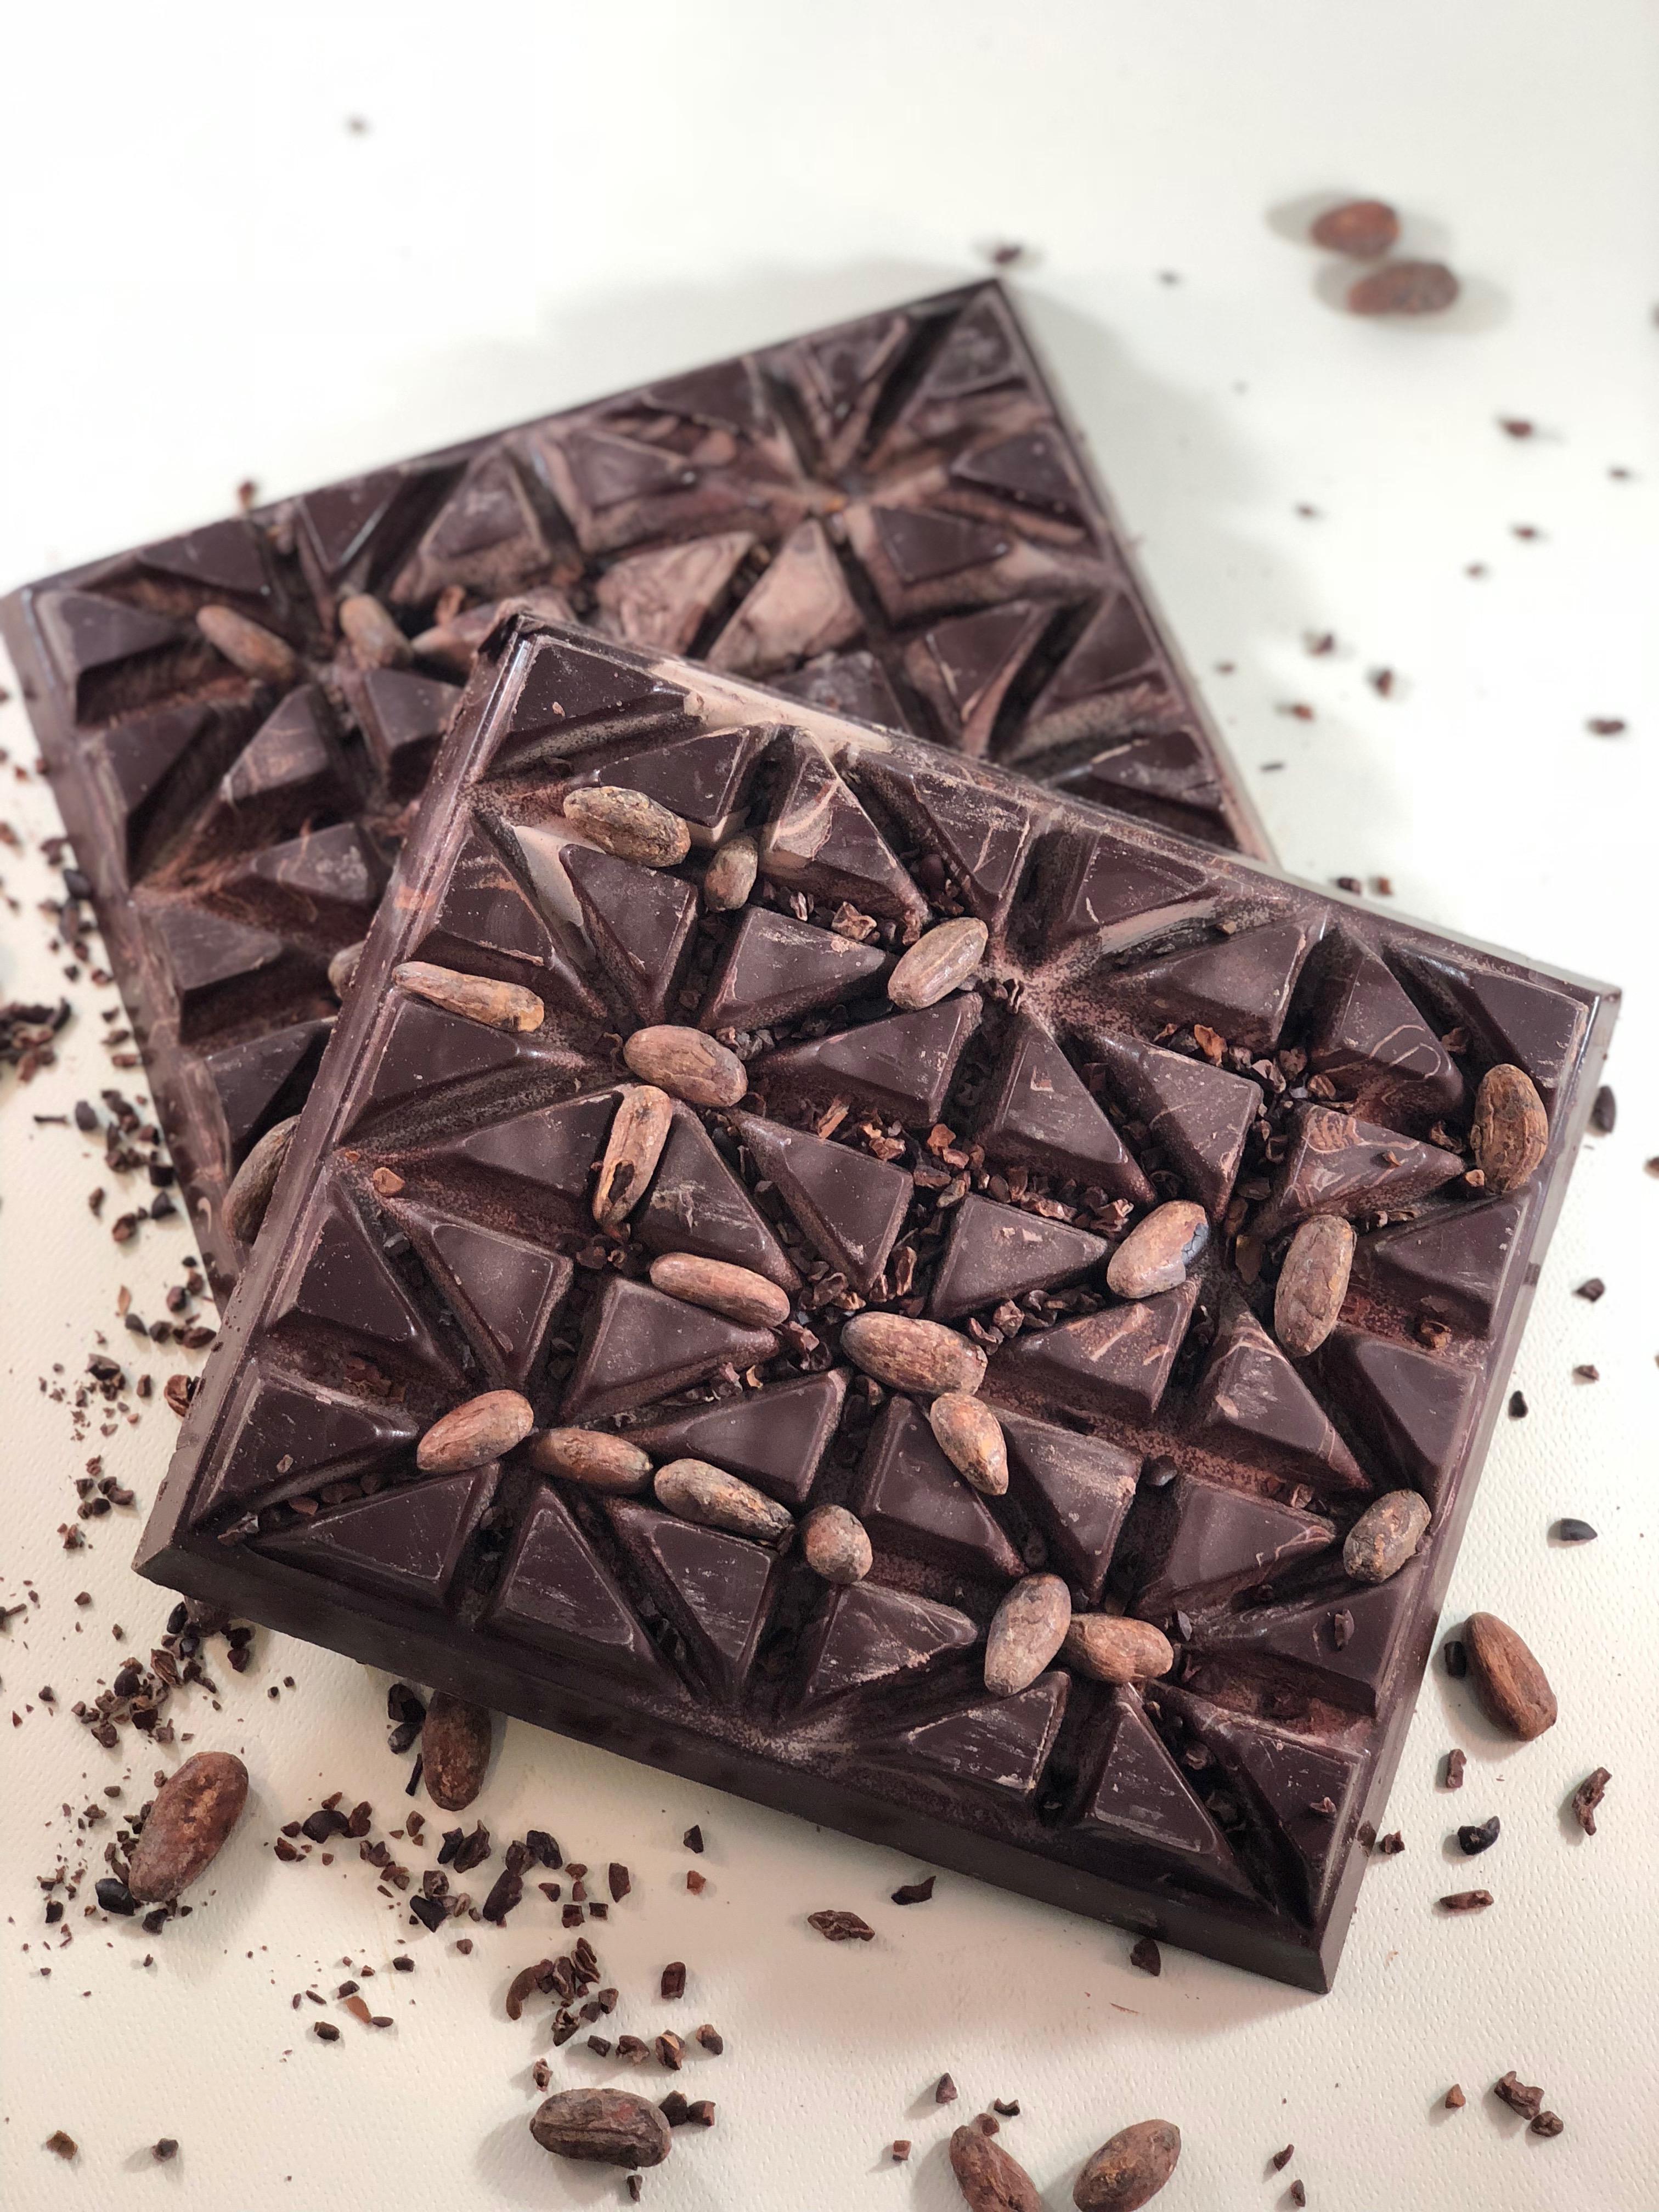 untempered chocolate block